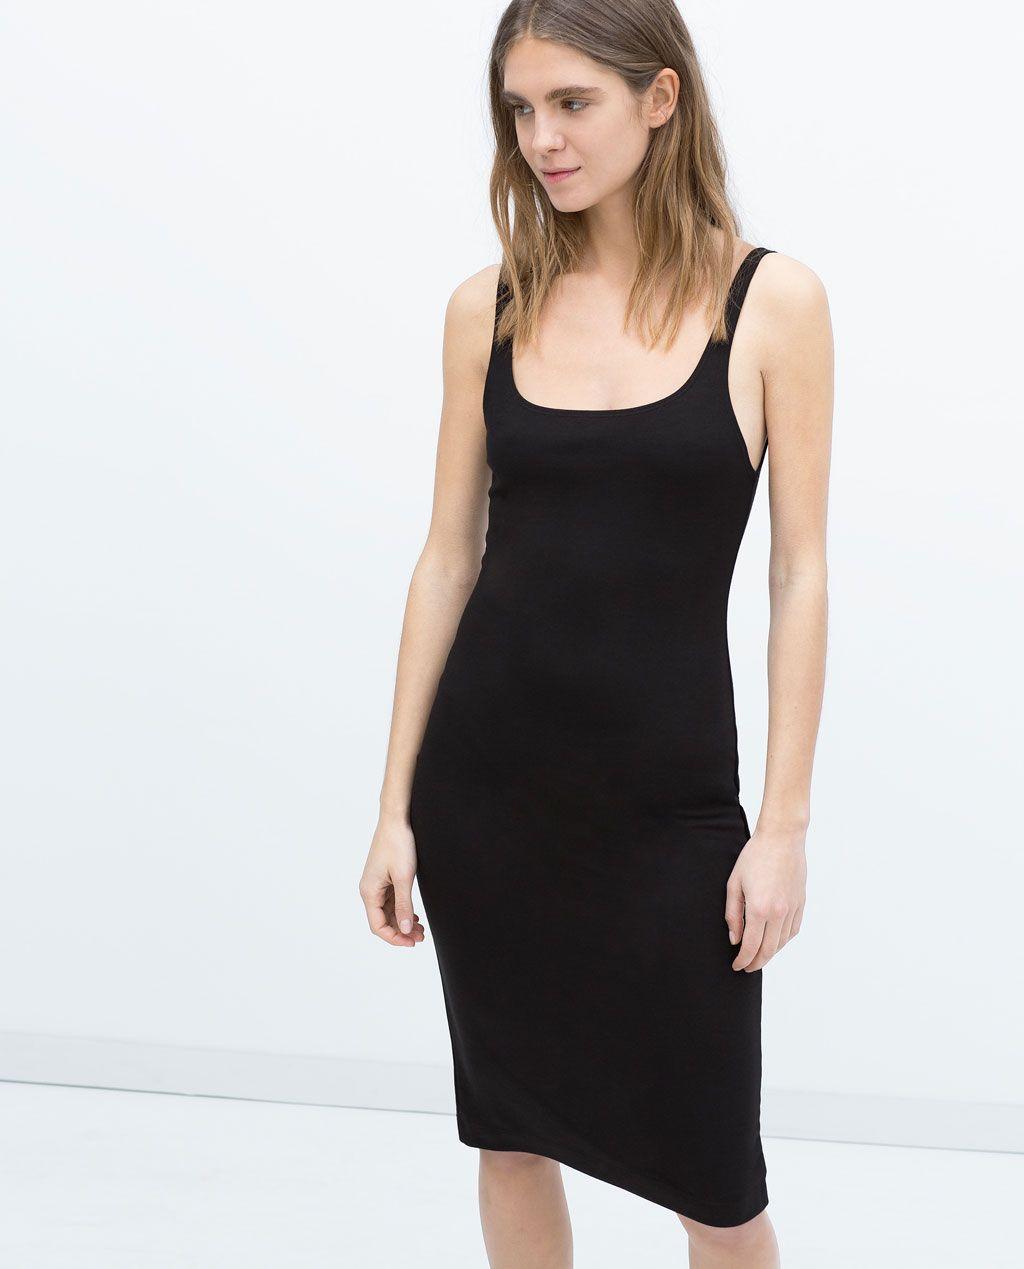 d2d181c967 Image 2 of BASIC SLEEVELESS DRESS from Zara   Get in my closet ...